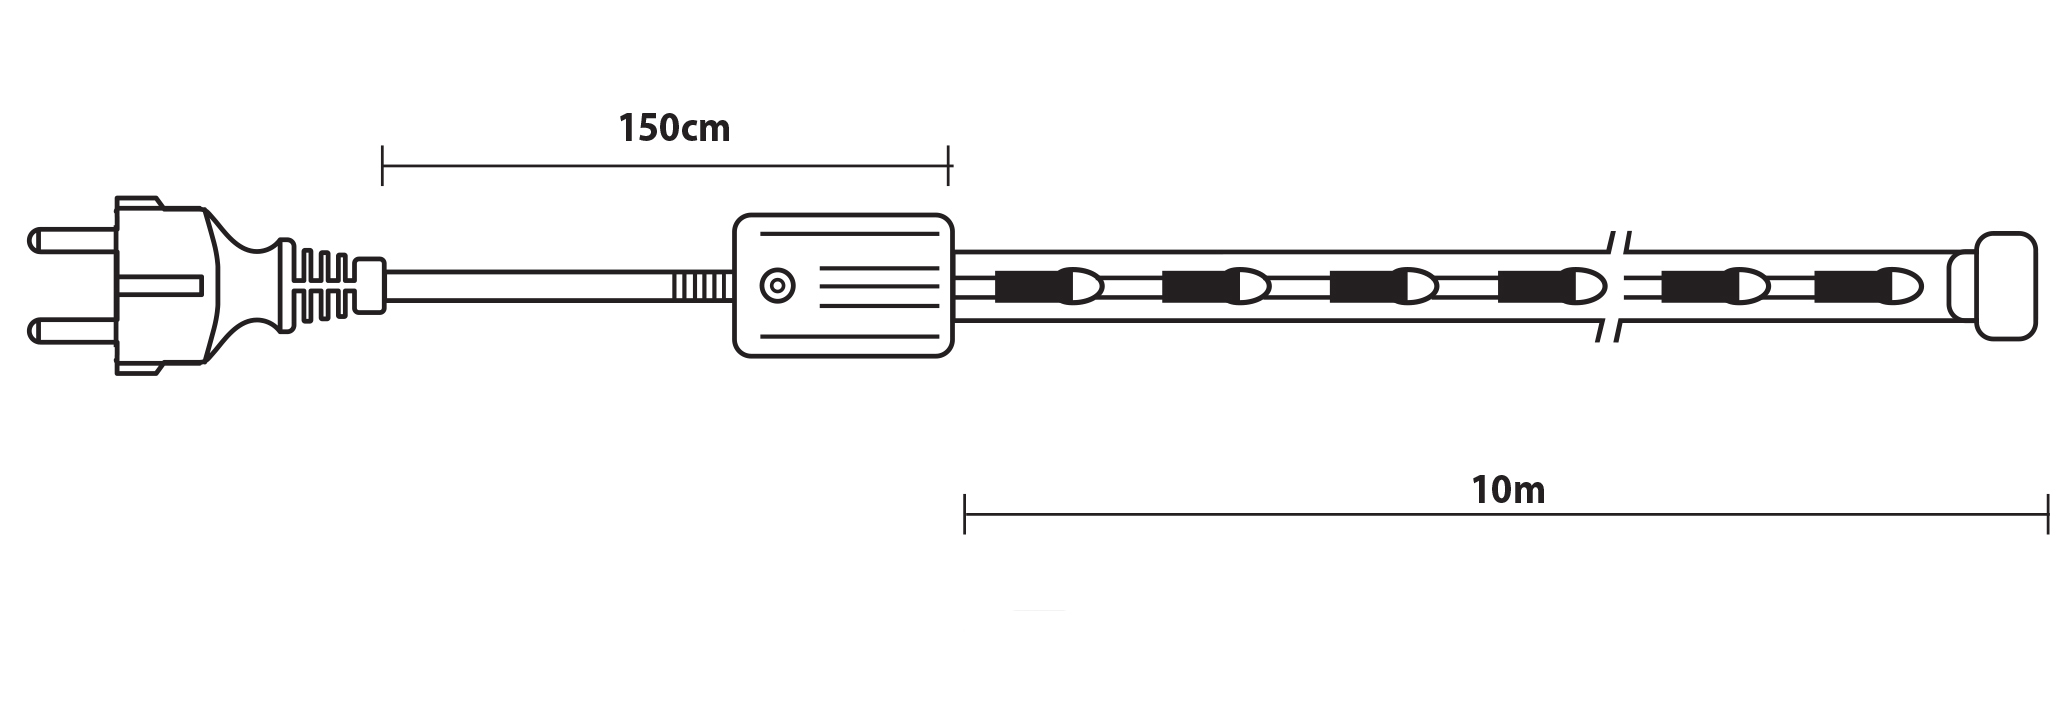 Gs Πολύχρωμος Φωτοσω΄λήνας Με Πρόγραμμα Απόστασης 10 Μέτρων ,Ø13mm - 3w